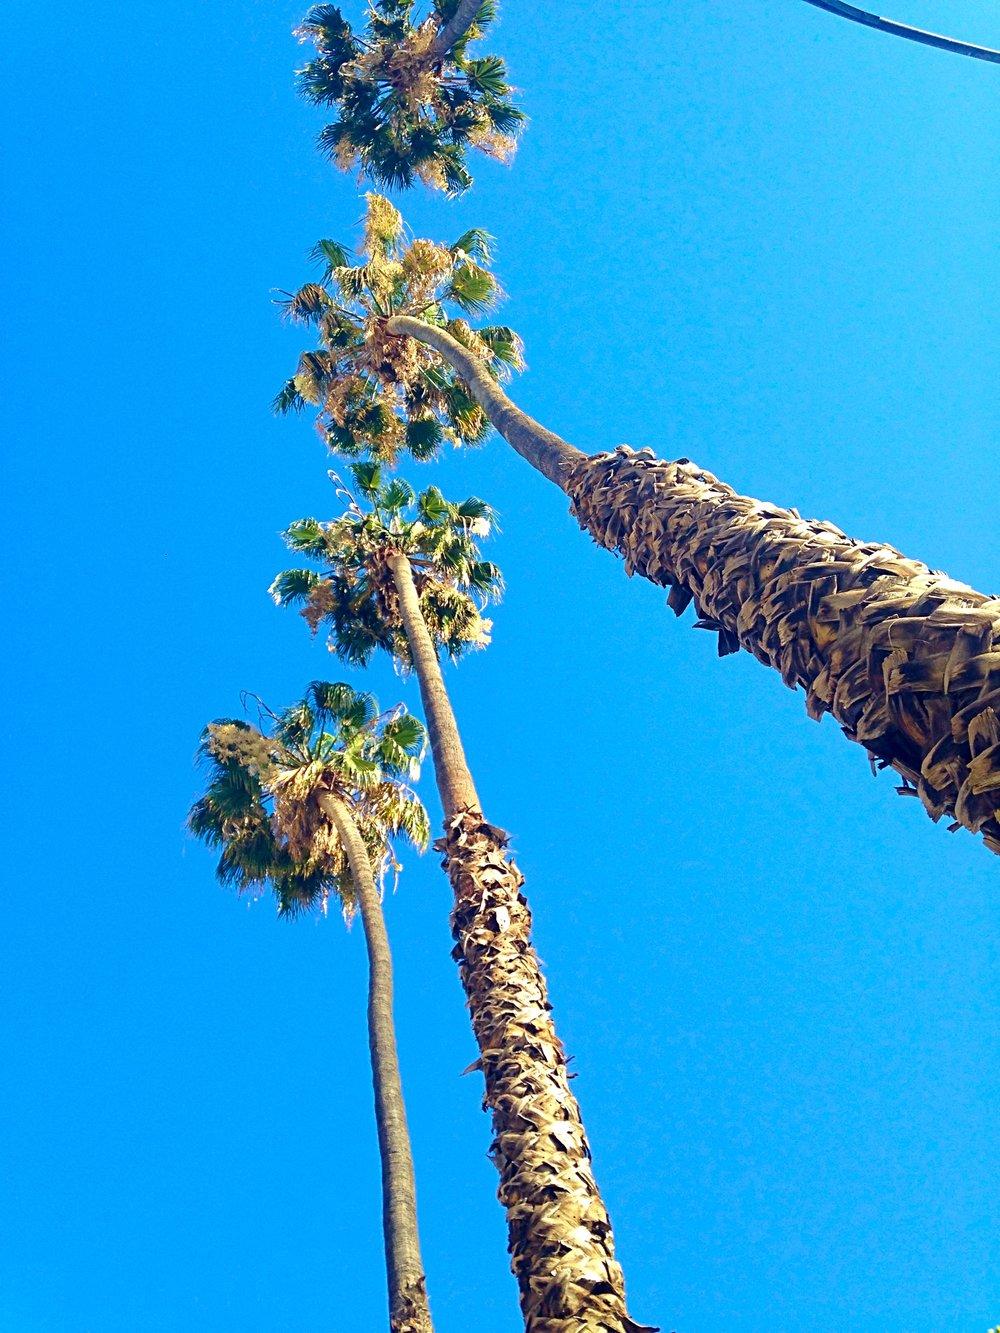 Palm trees in San Jose, CA